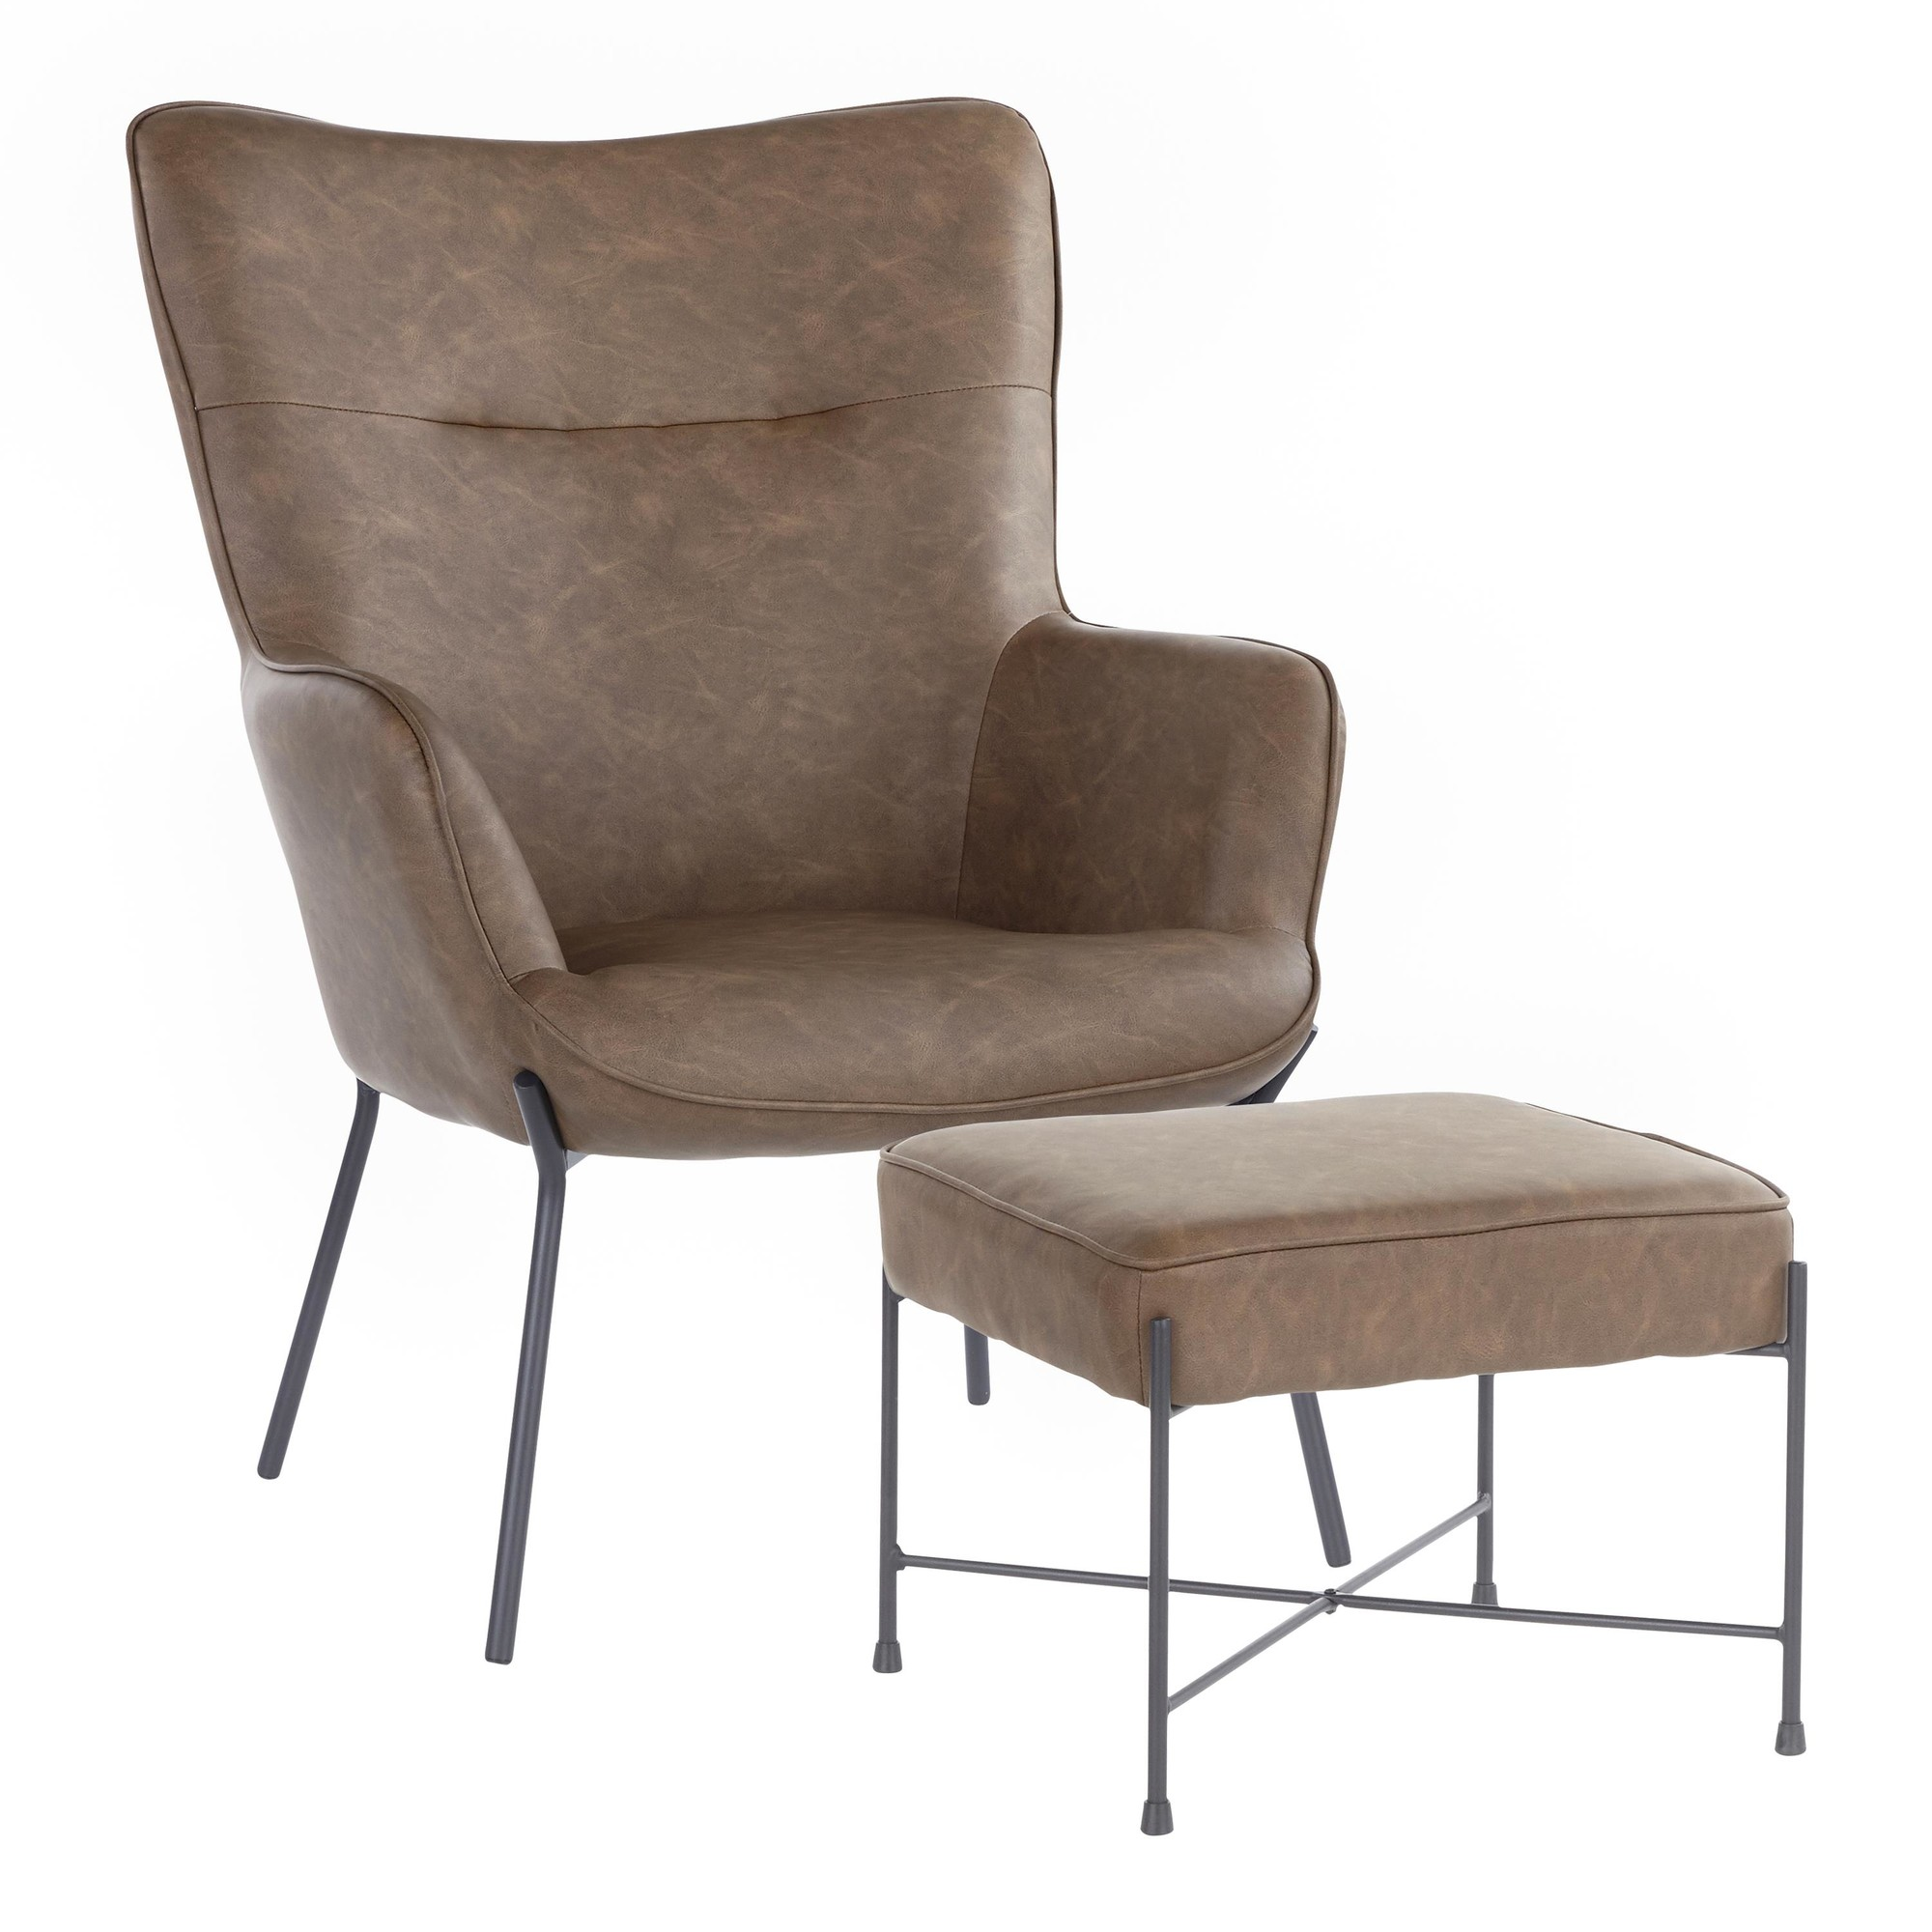 Izzy Lounge Chair Ottoman Set